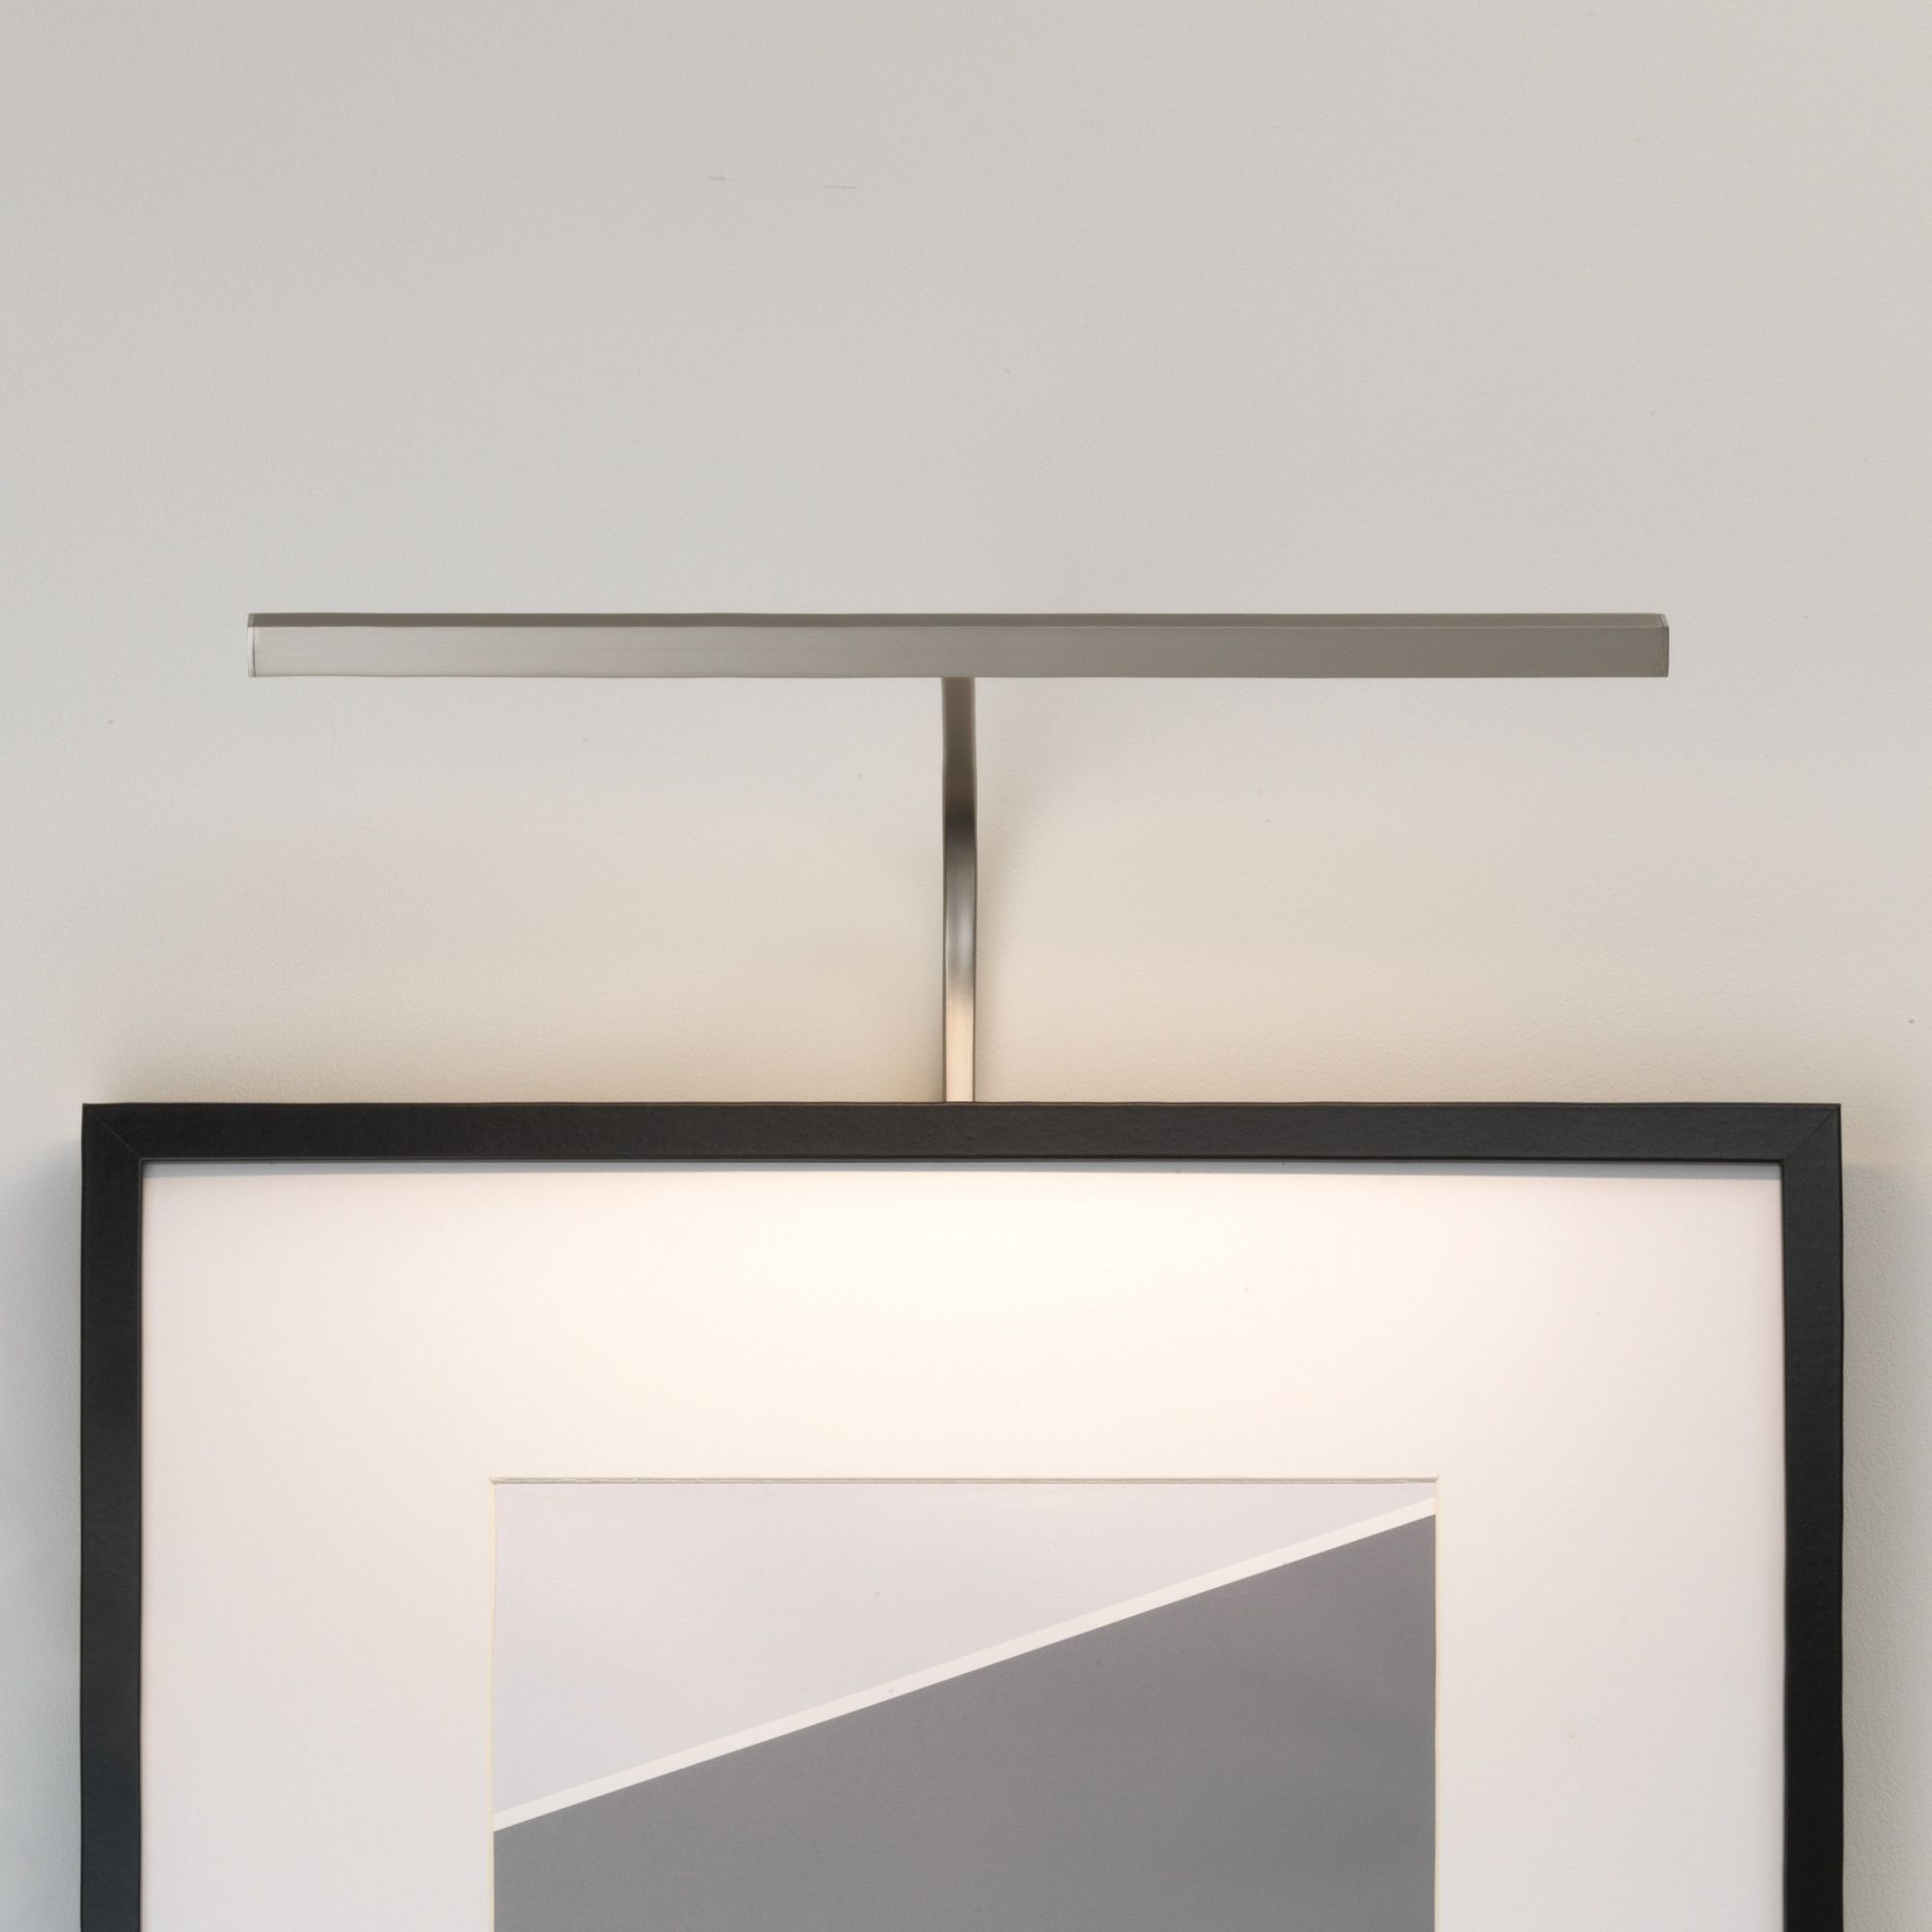 Kinkiet nad obrazy Mondrian 400 7890 Astro Lighting